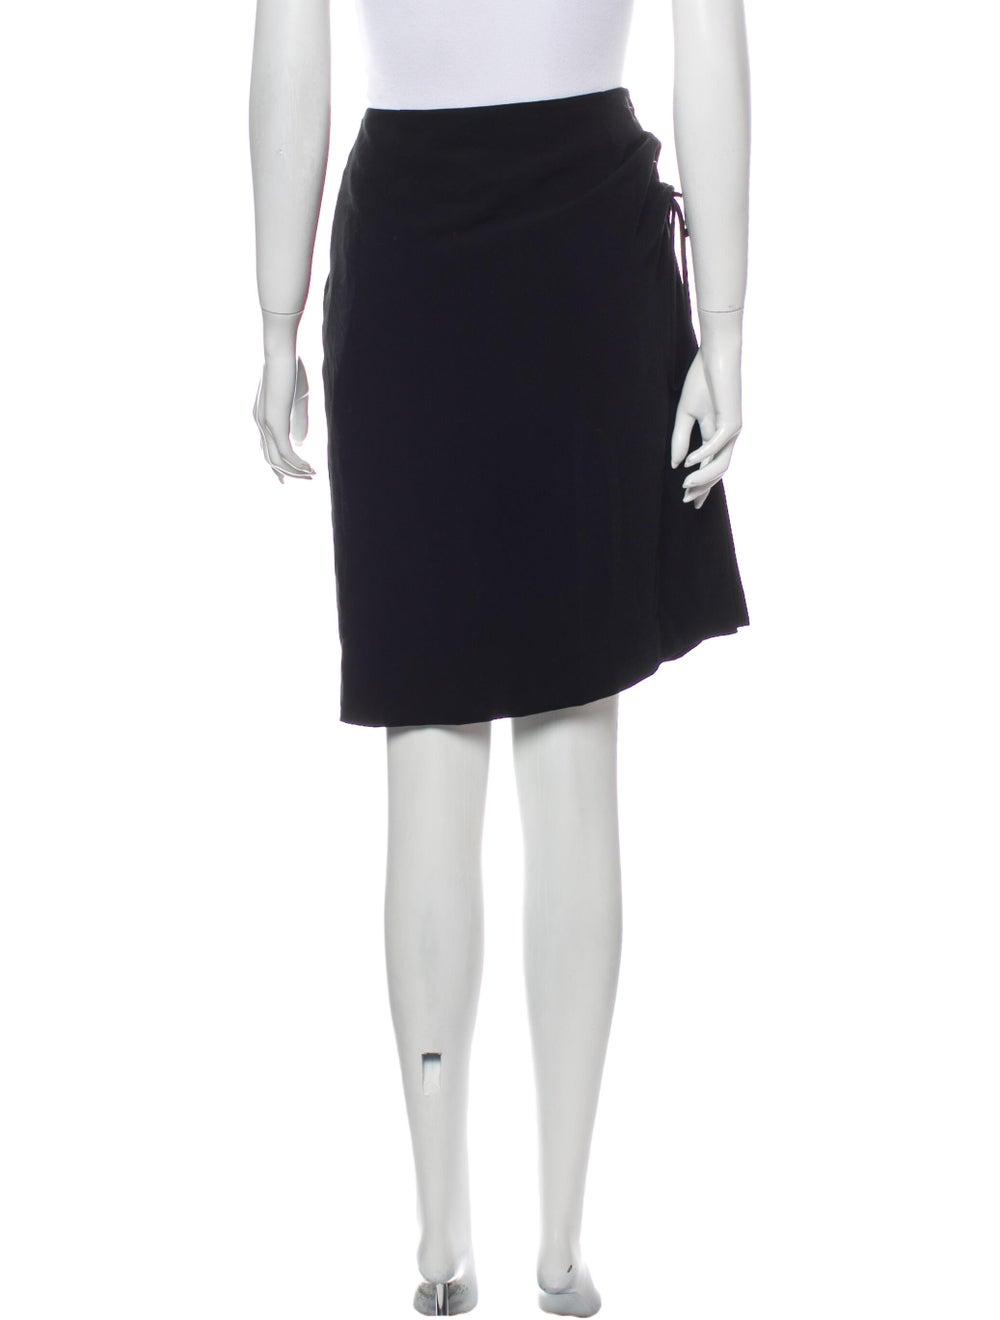 Krizia Knee-Length Skirt Black - image 3